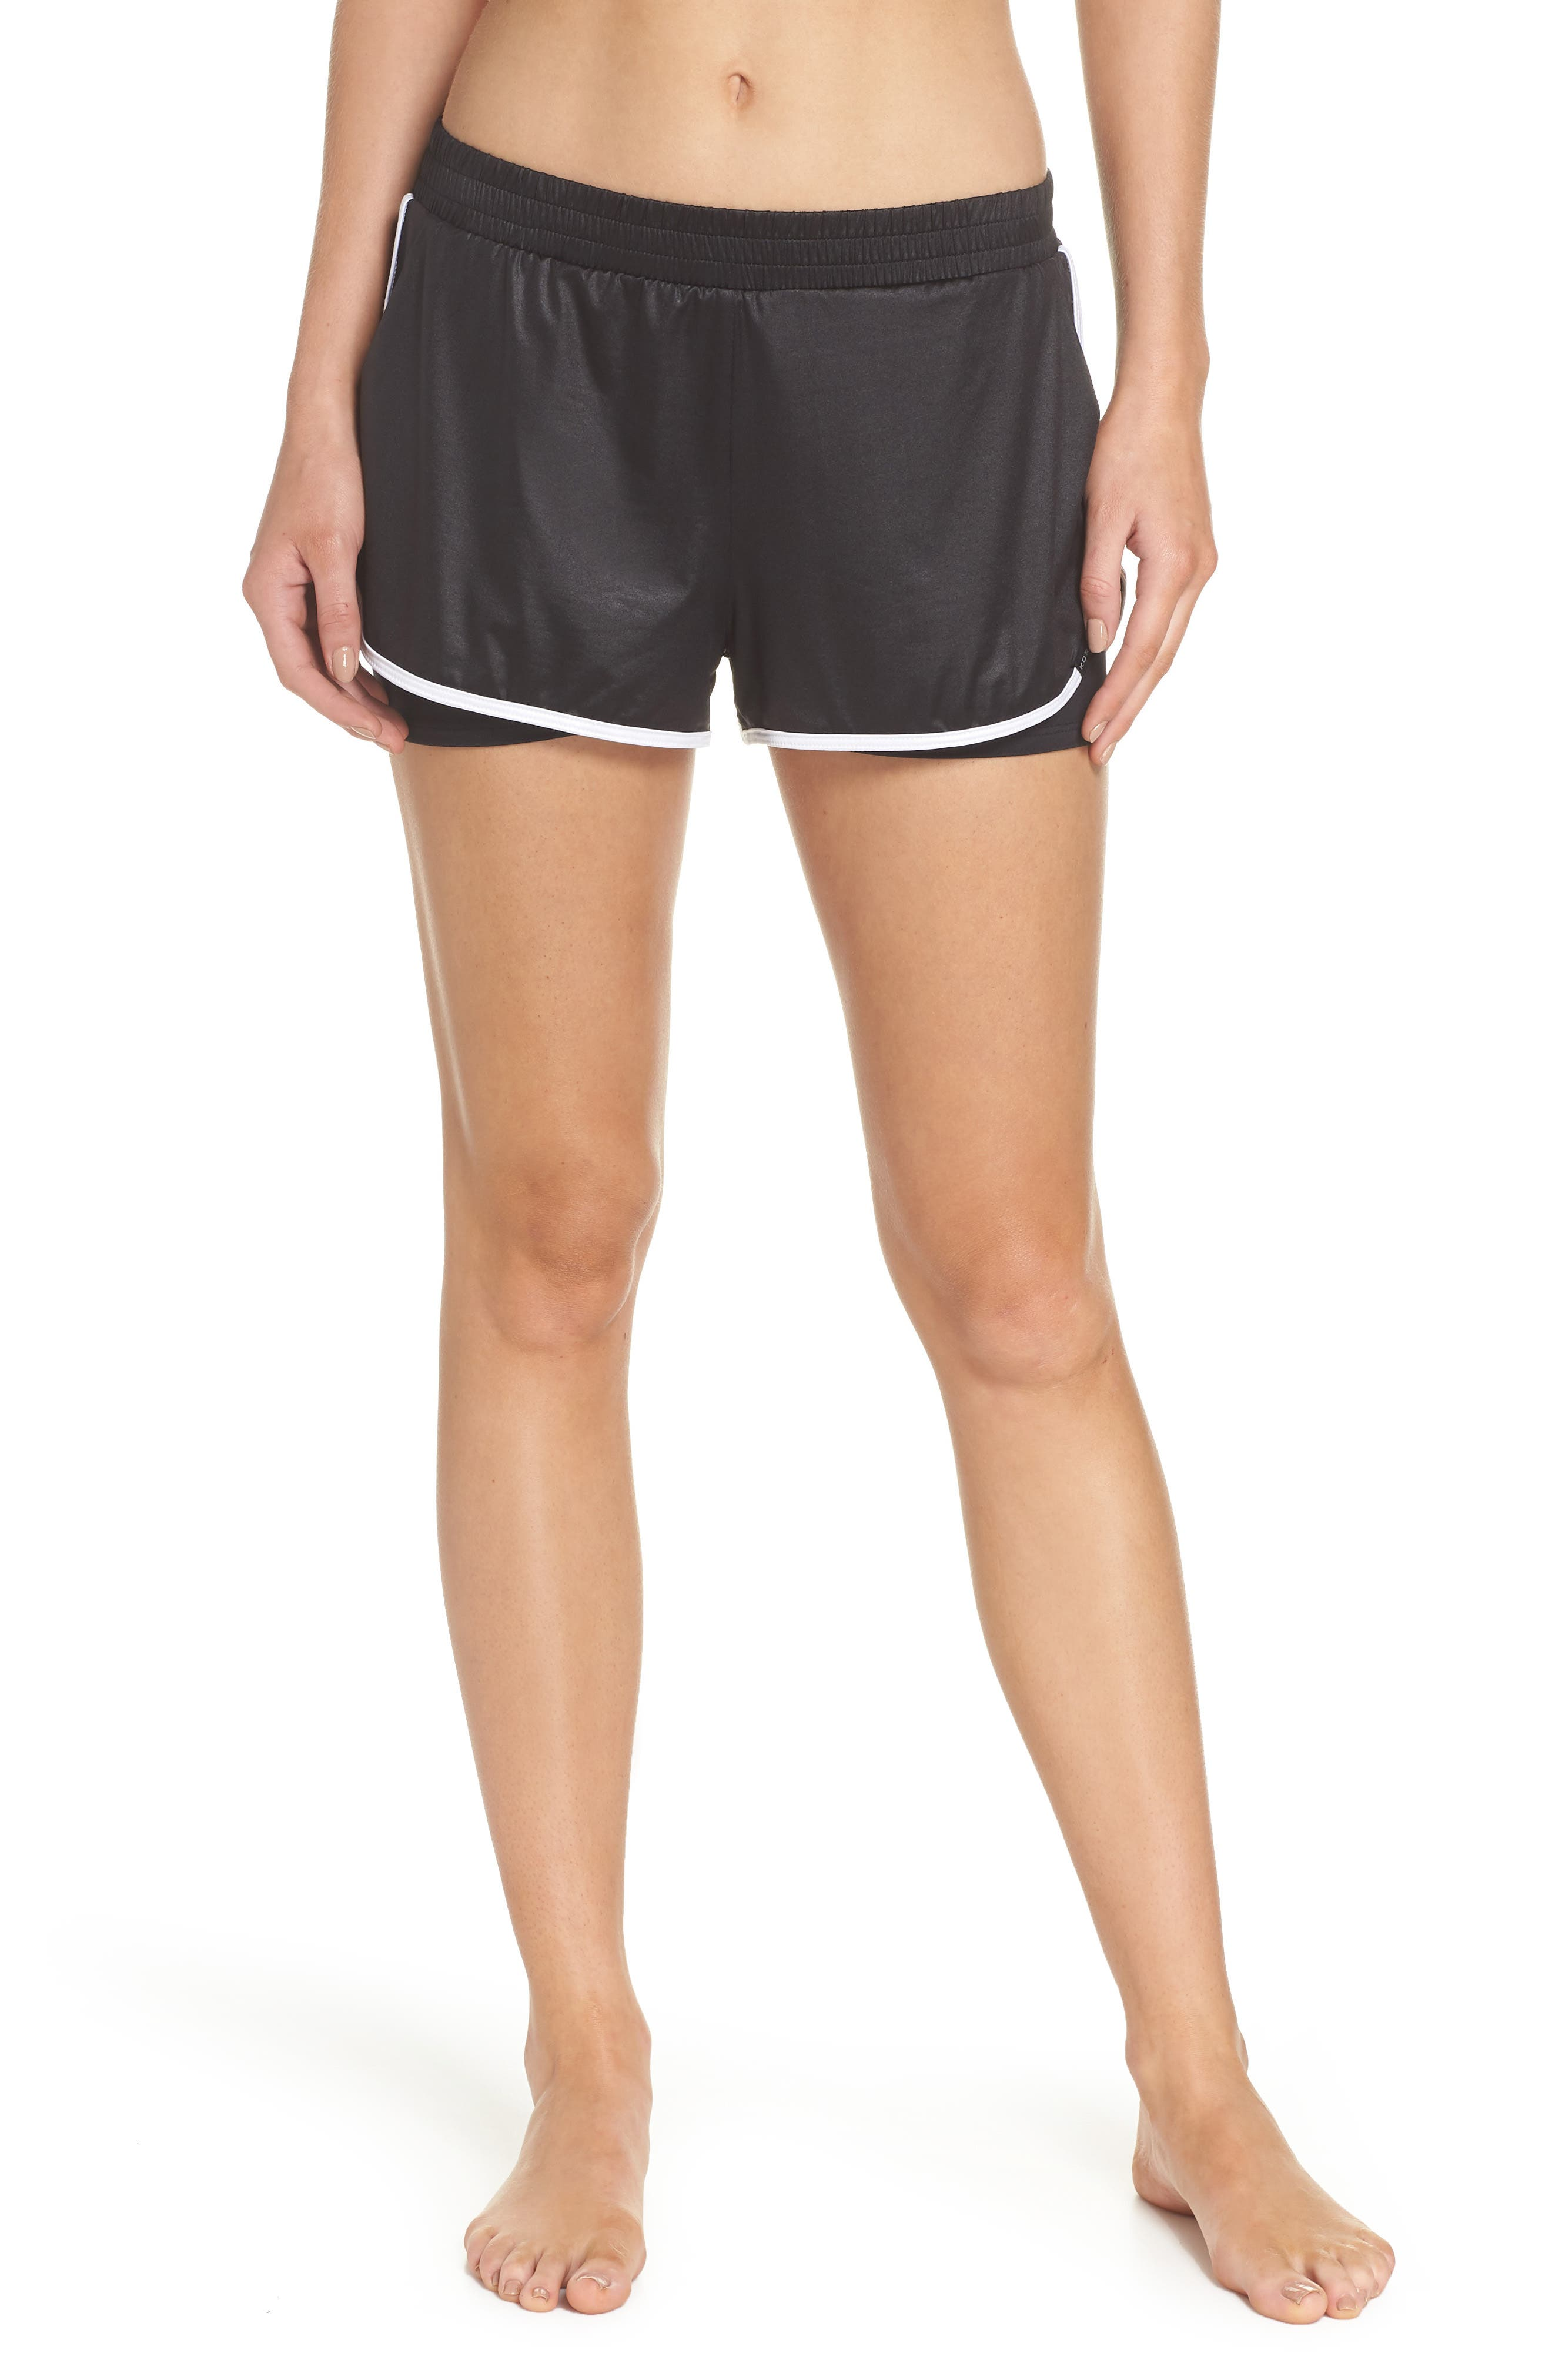 Scout Gym Shorts,                         Main,                         color, BLACK/ WHITE